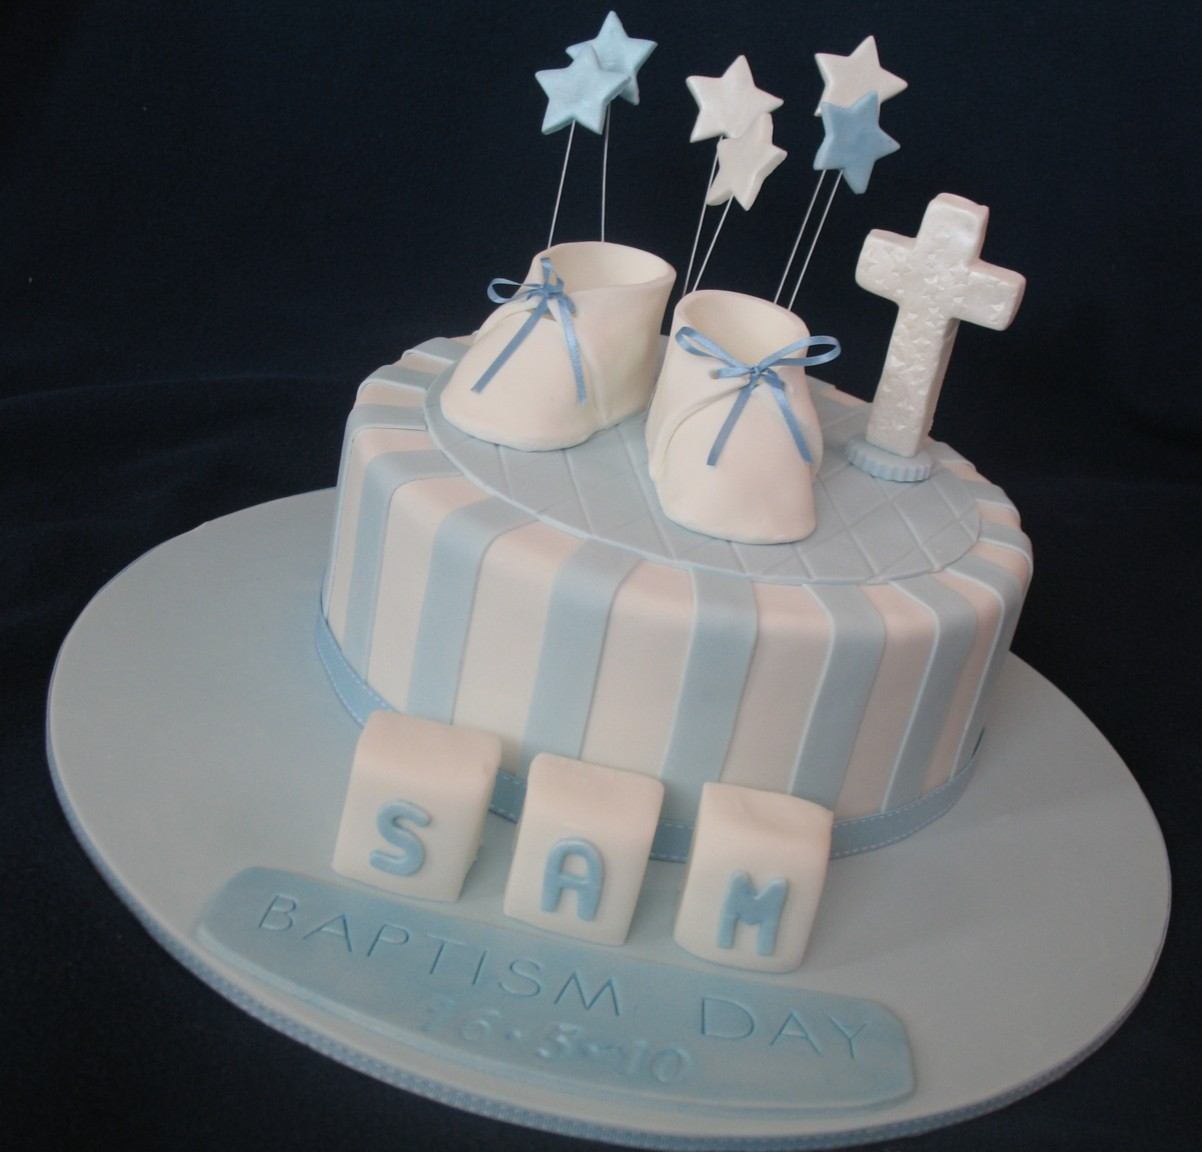 Blissfully Sweet A Taste Of Boy Baptism Cake